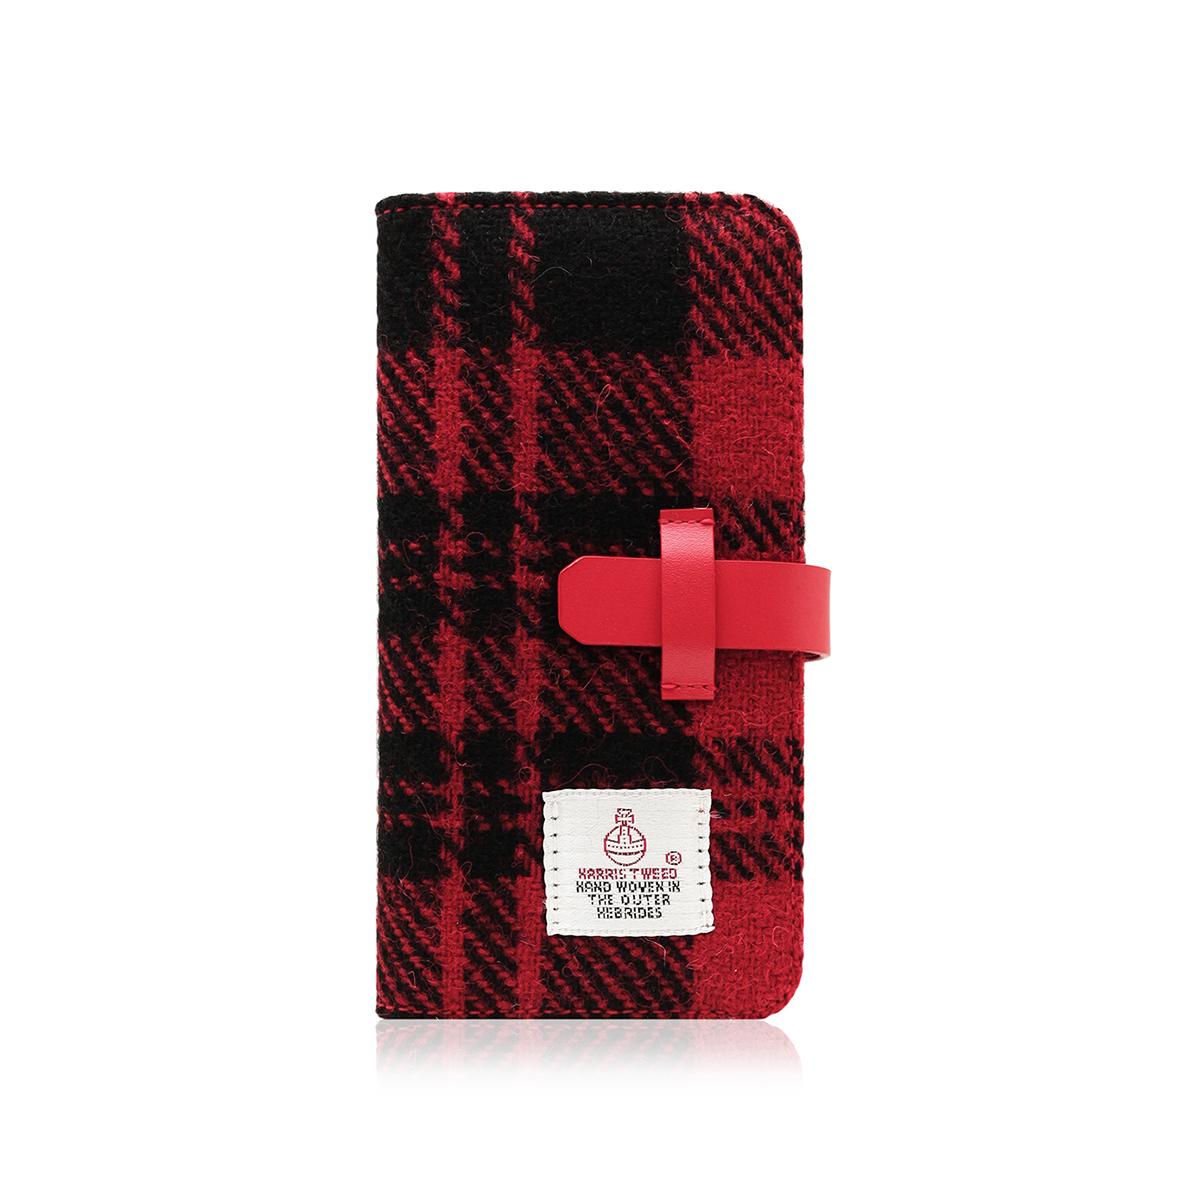 iPhone 8 Plus / 7 Plus ケース 手帳型 SLG Design Harris Tweed Diary (エスエルジーデザイン ハリスツイードダイアリー)アイフォン 本革 カバー